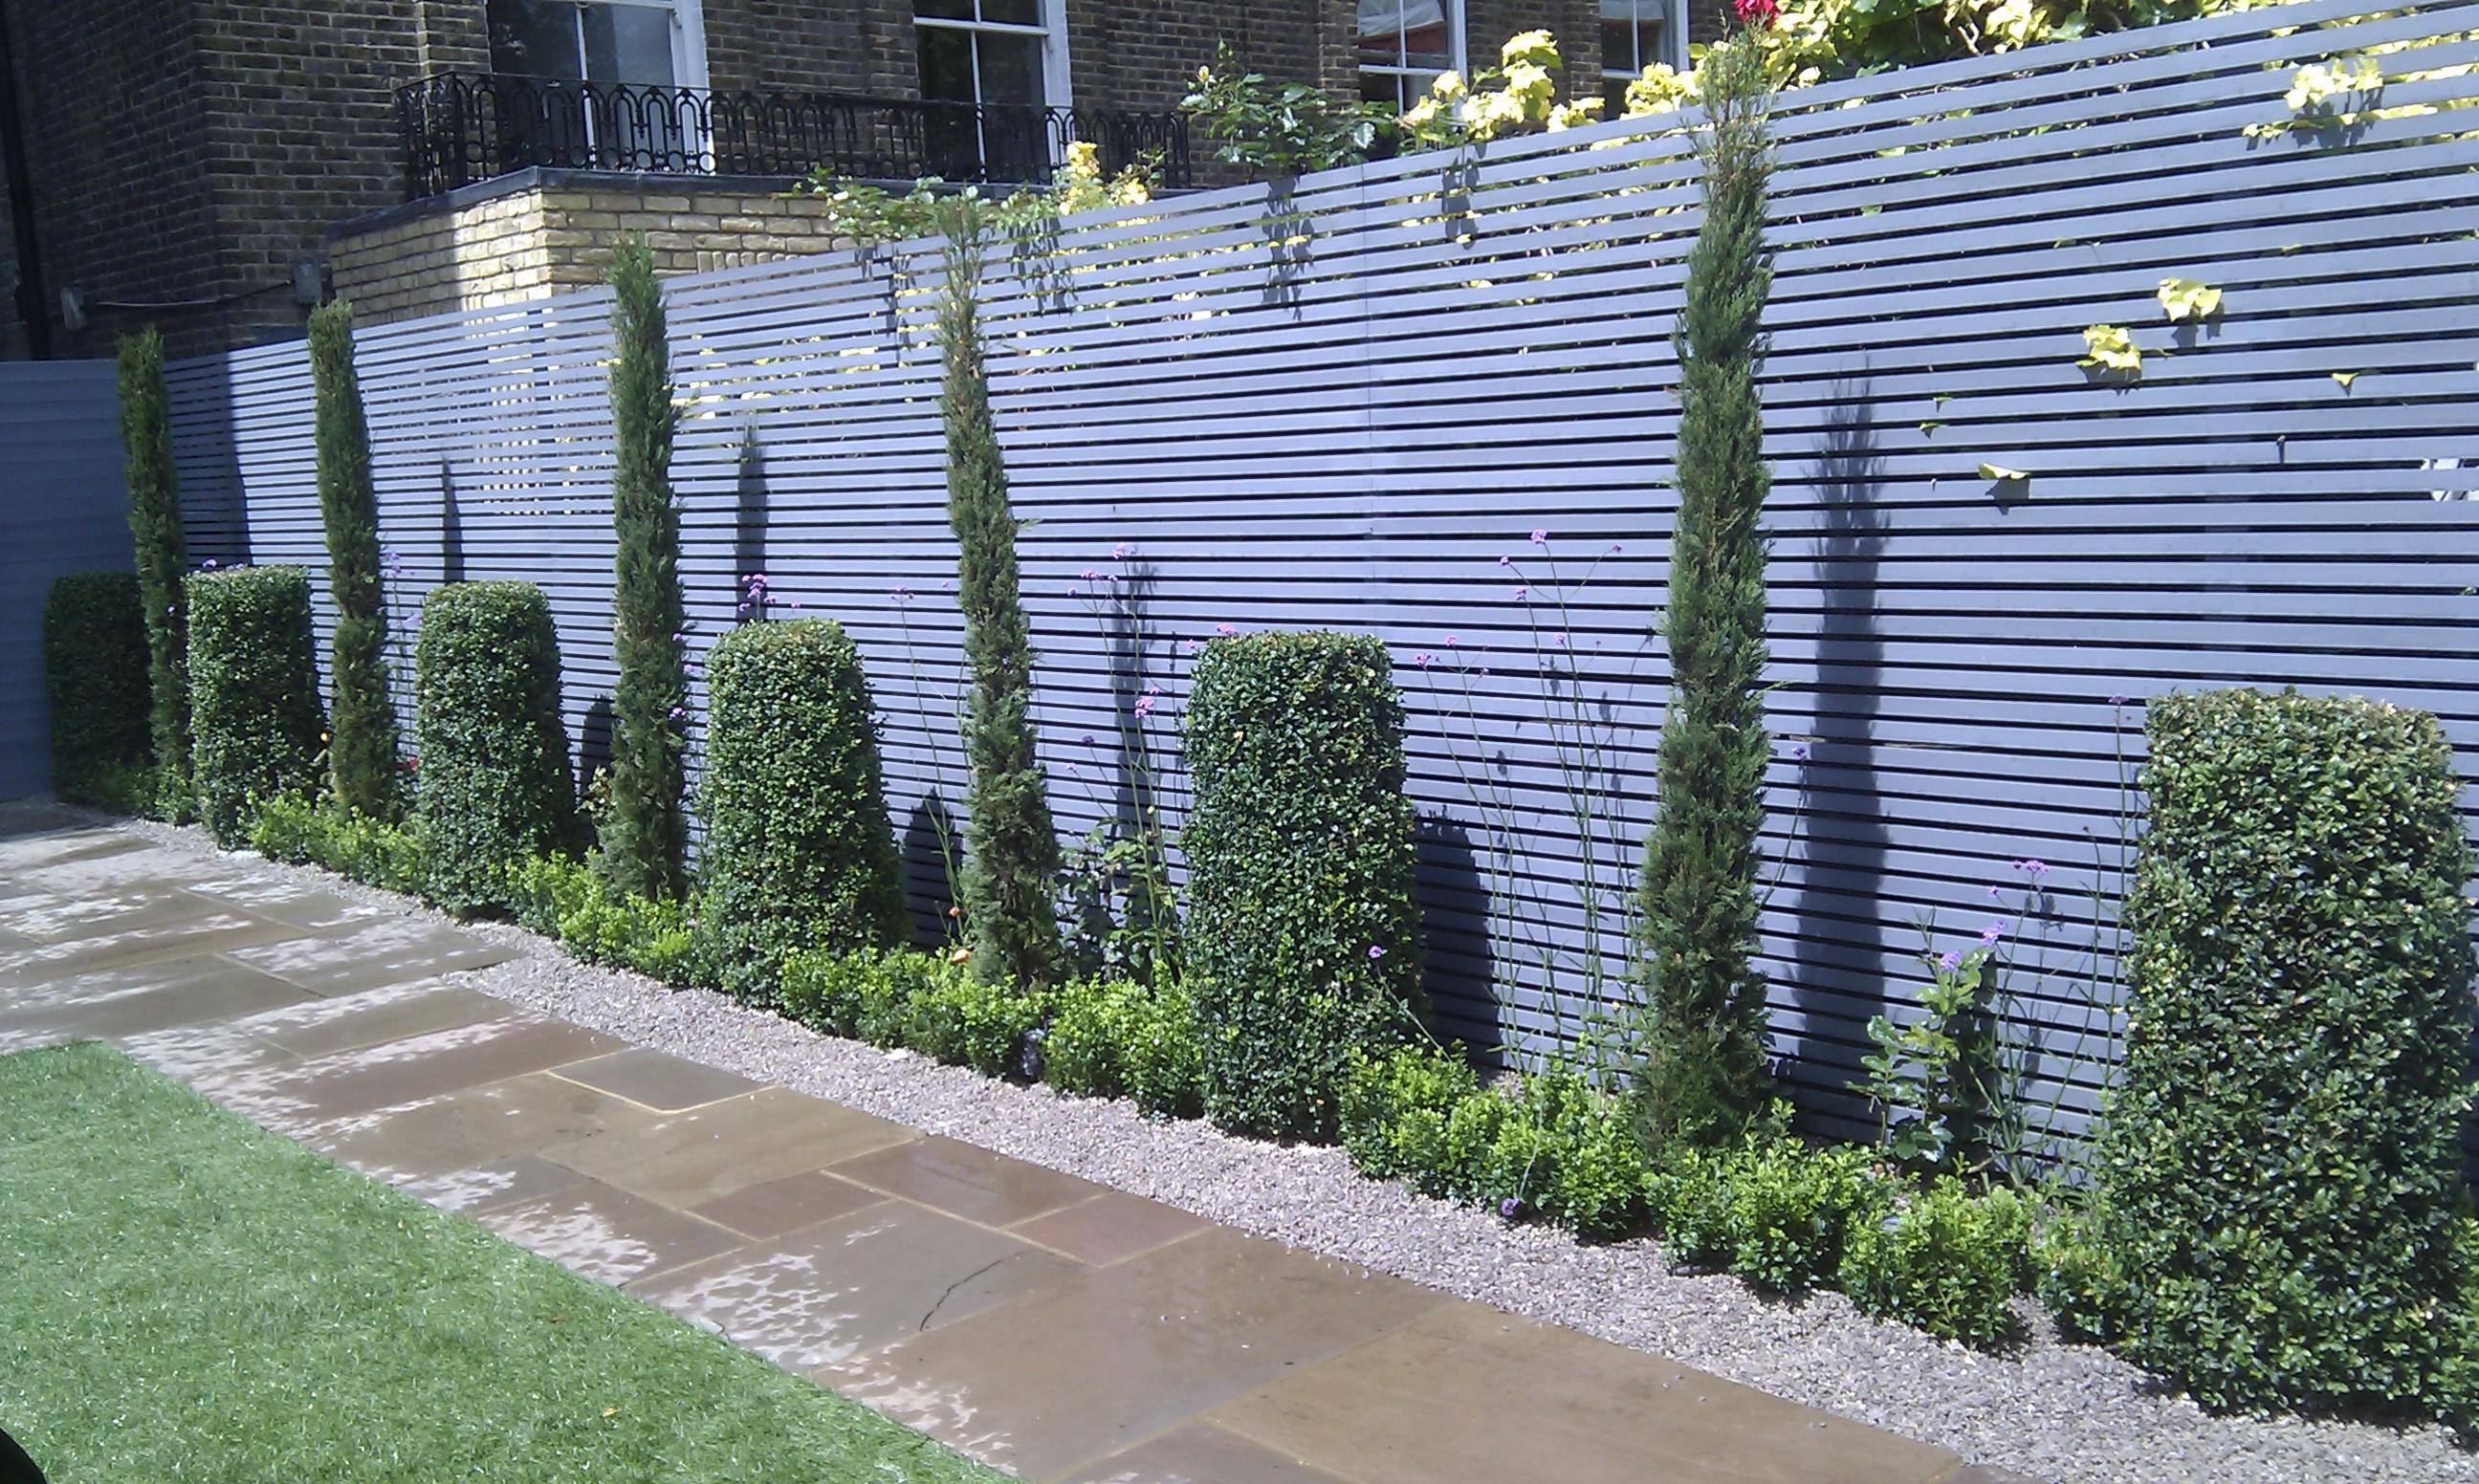 modern garden design london slatted grey privacy screen sandstone paving easy grass balau hardwood decking (2)